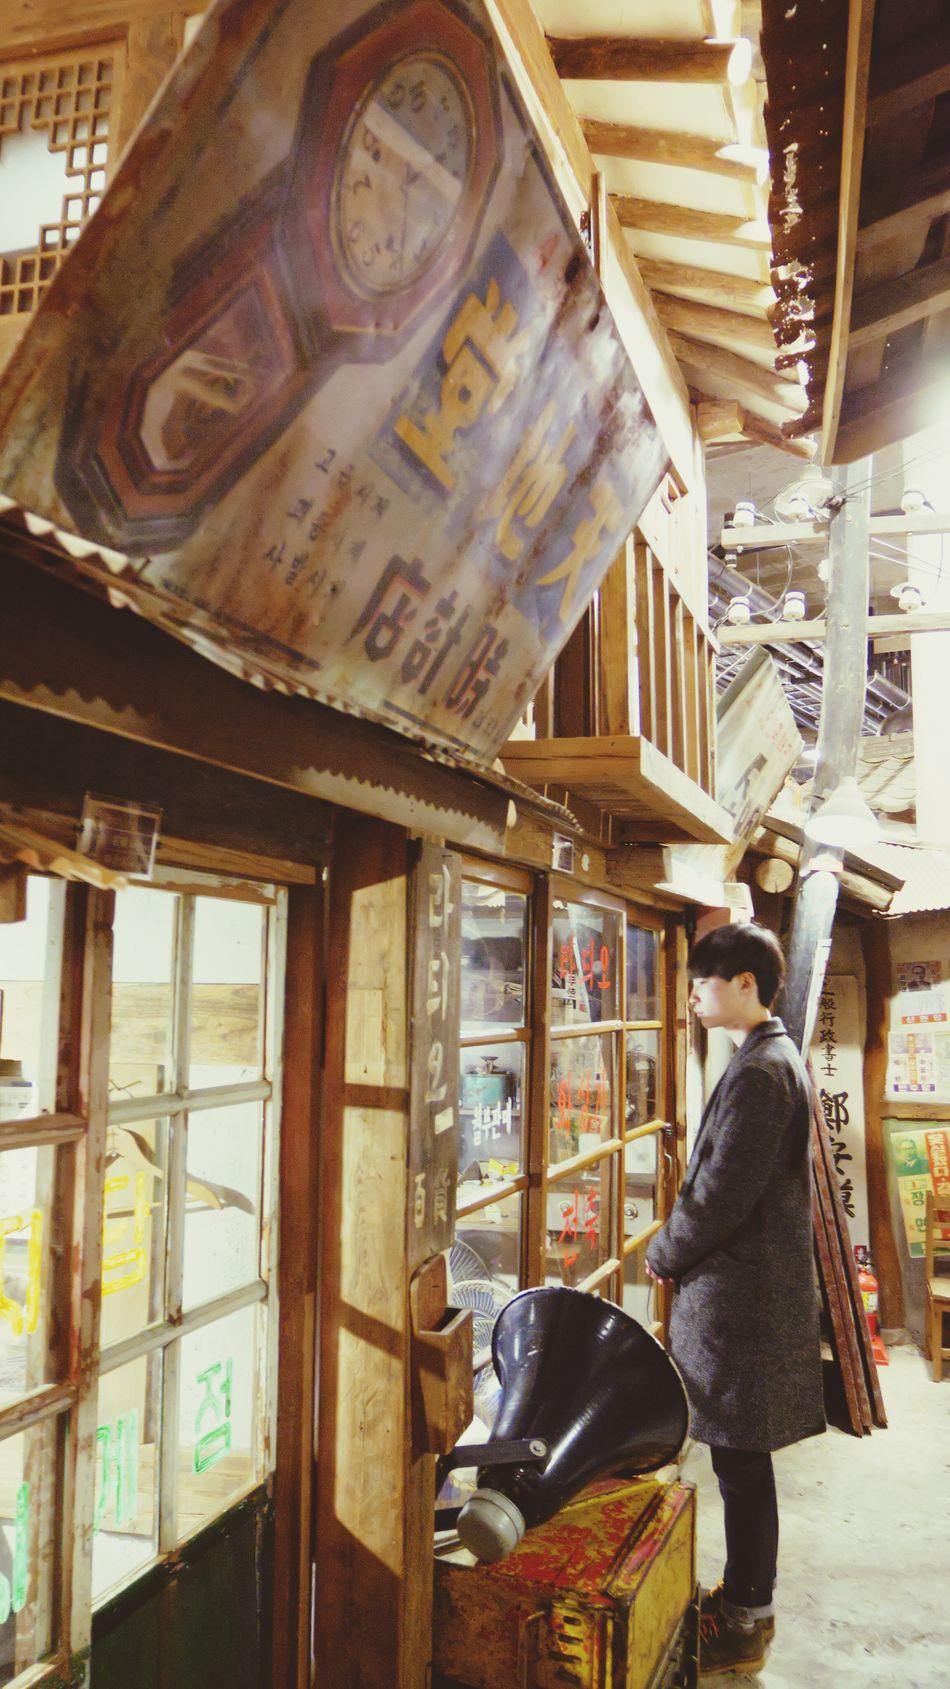 Real People Lifestyles Travel Korea Photos Korea Travel Photography People Koreanstyle Paju, S. Korea Paju Men